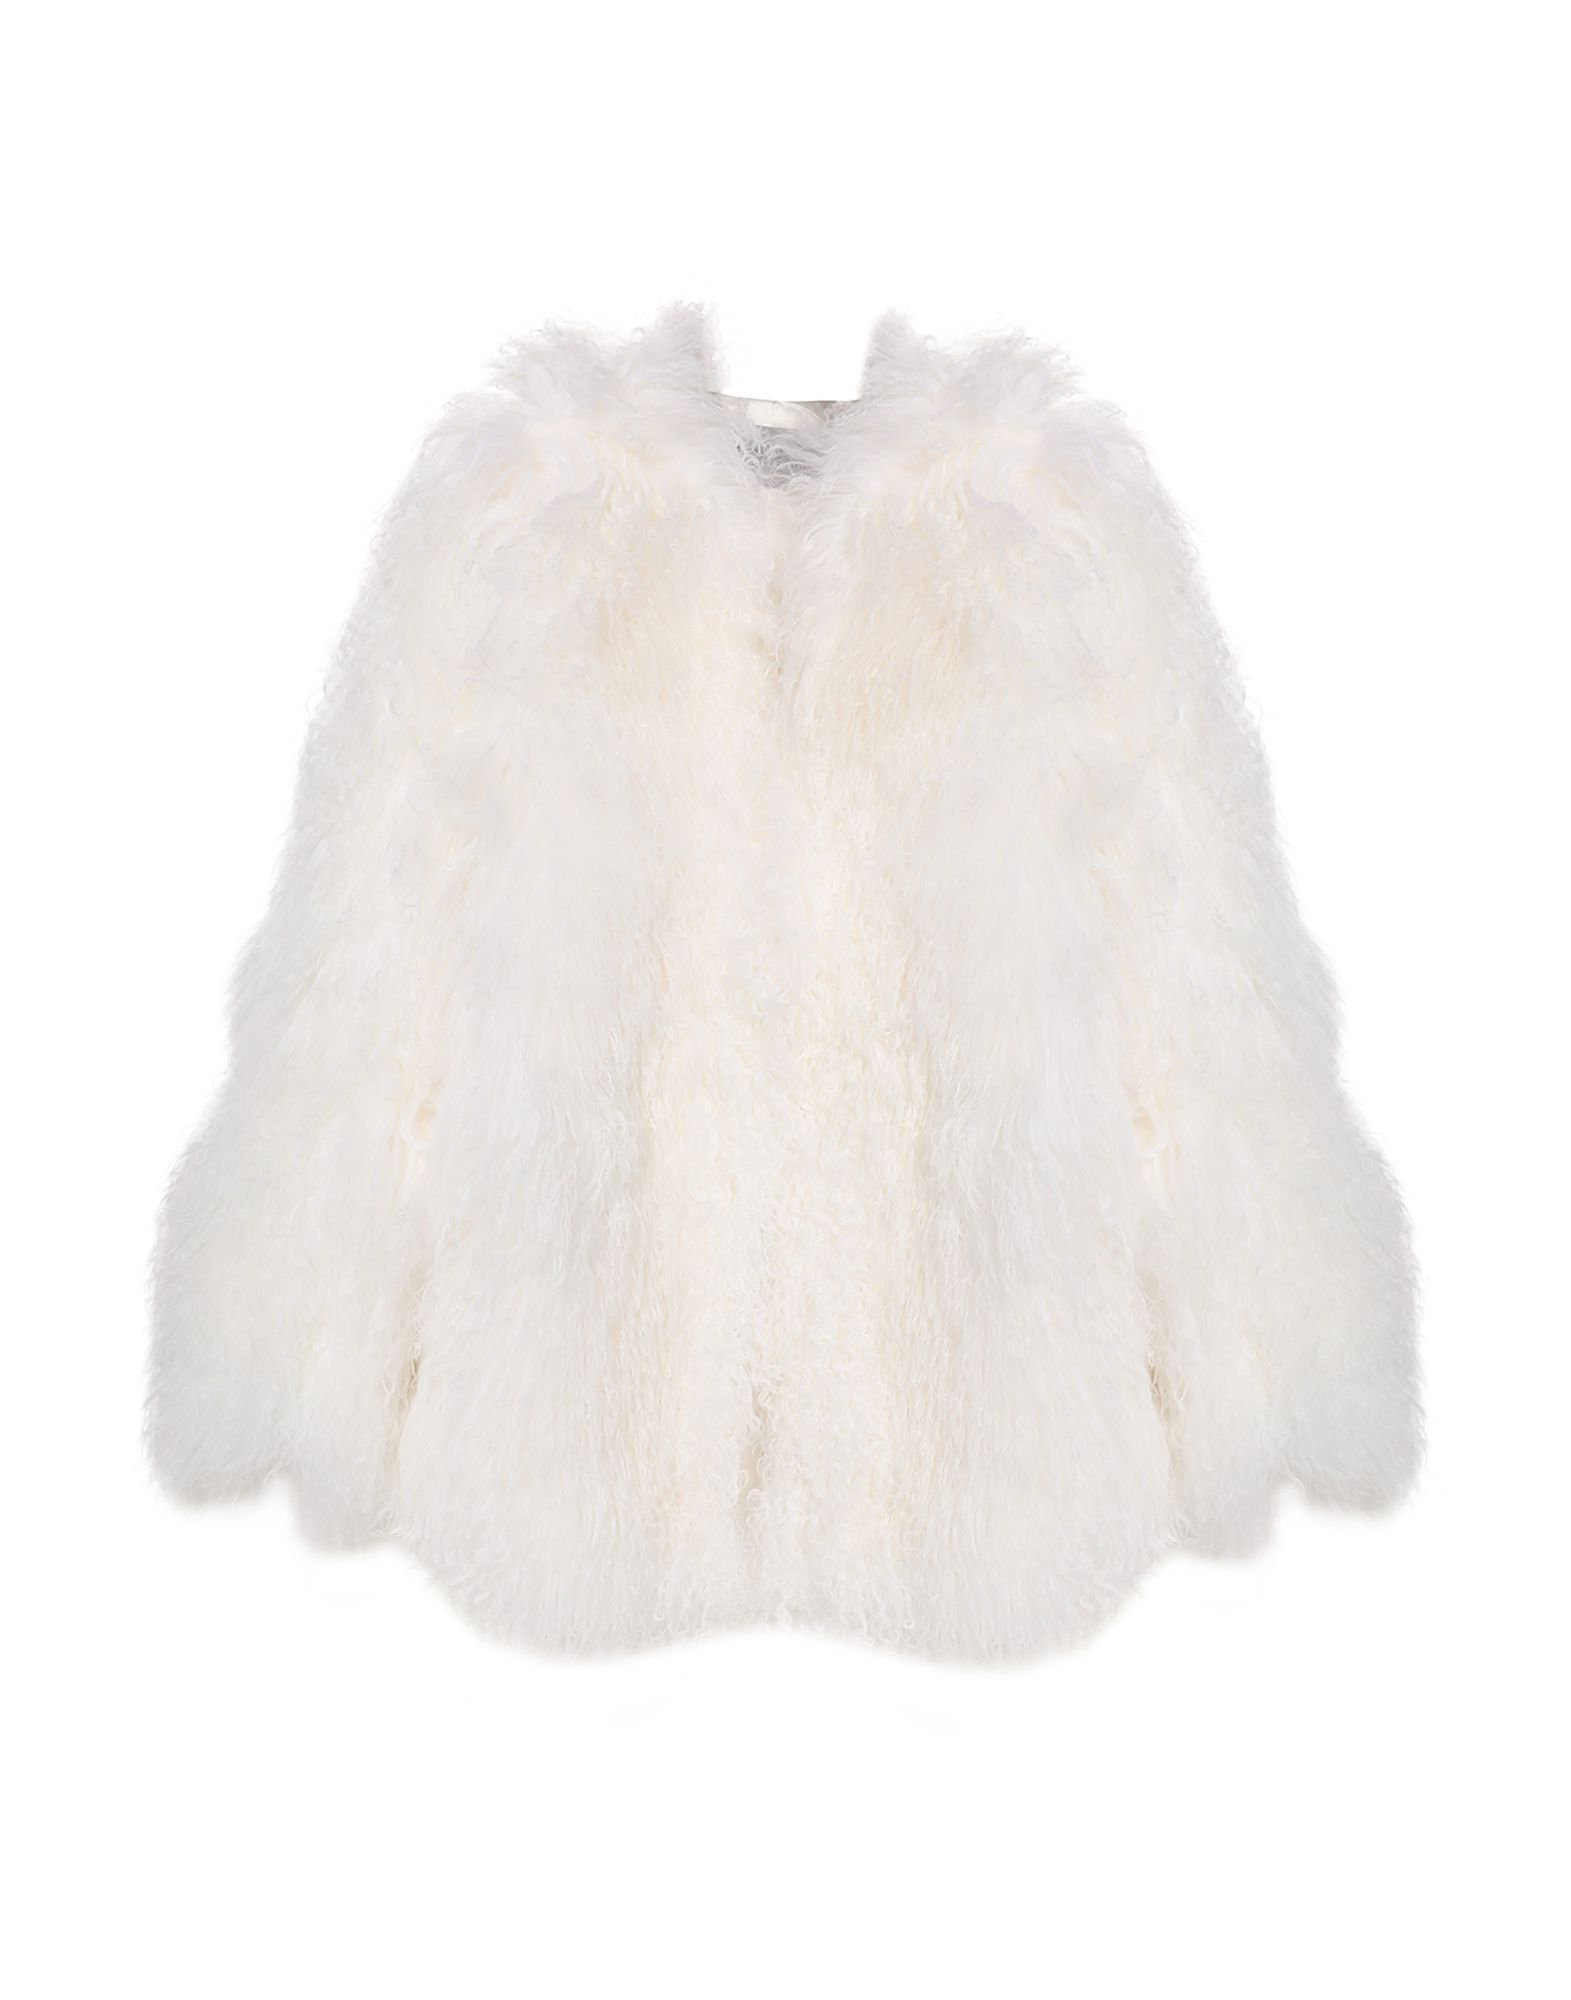 Tart Collections Women's Coats Mongolian Fur